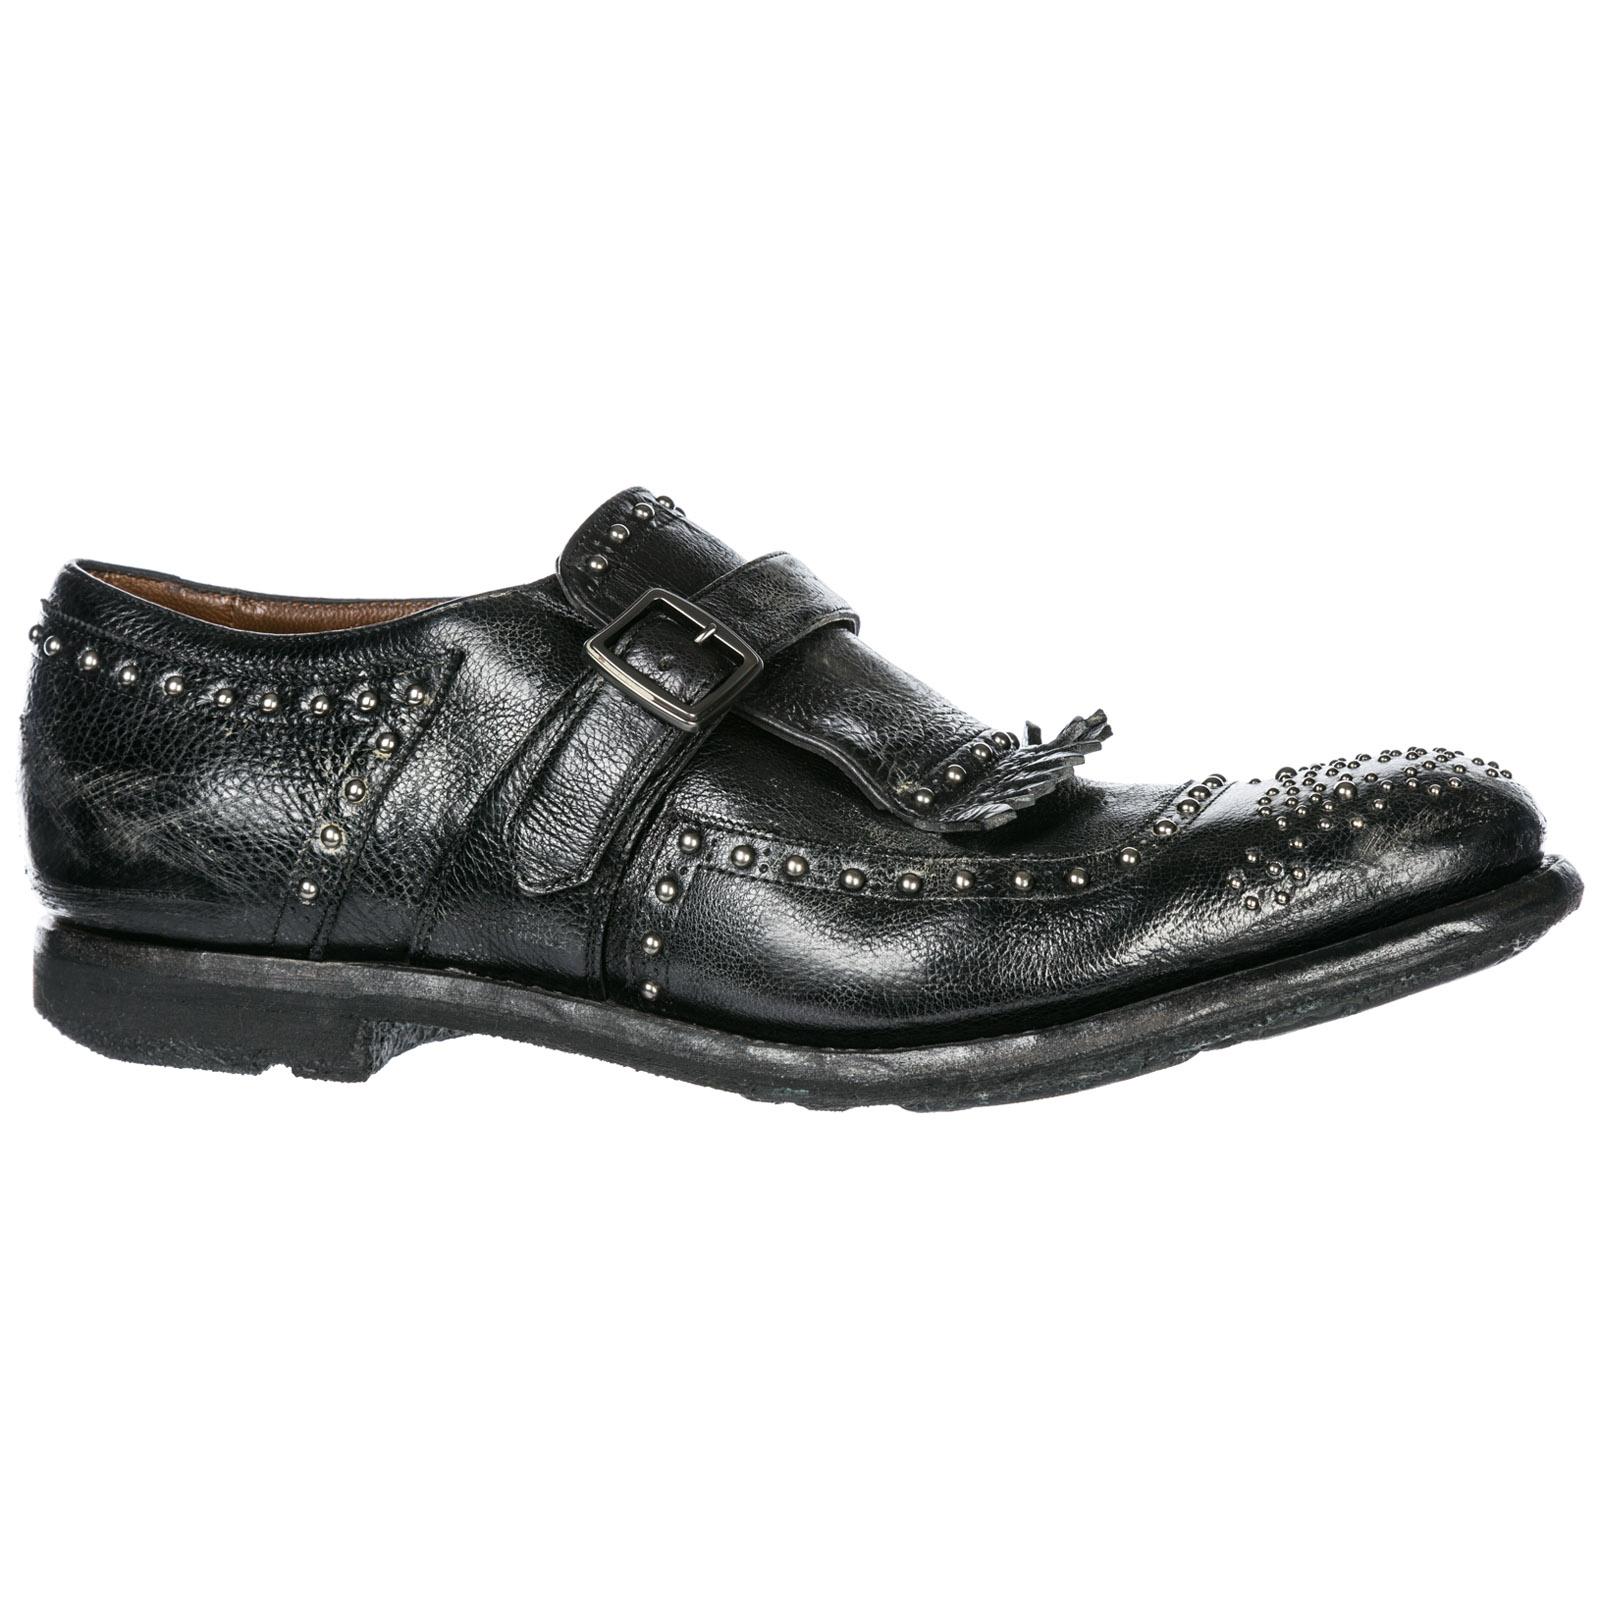 Men's classic leather formal shoes slip on shangai